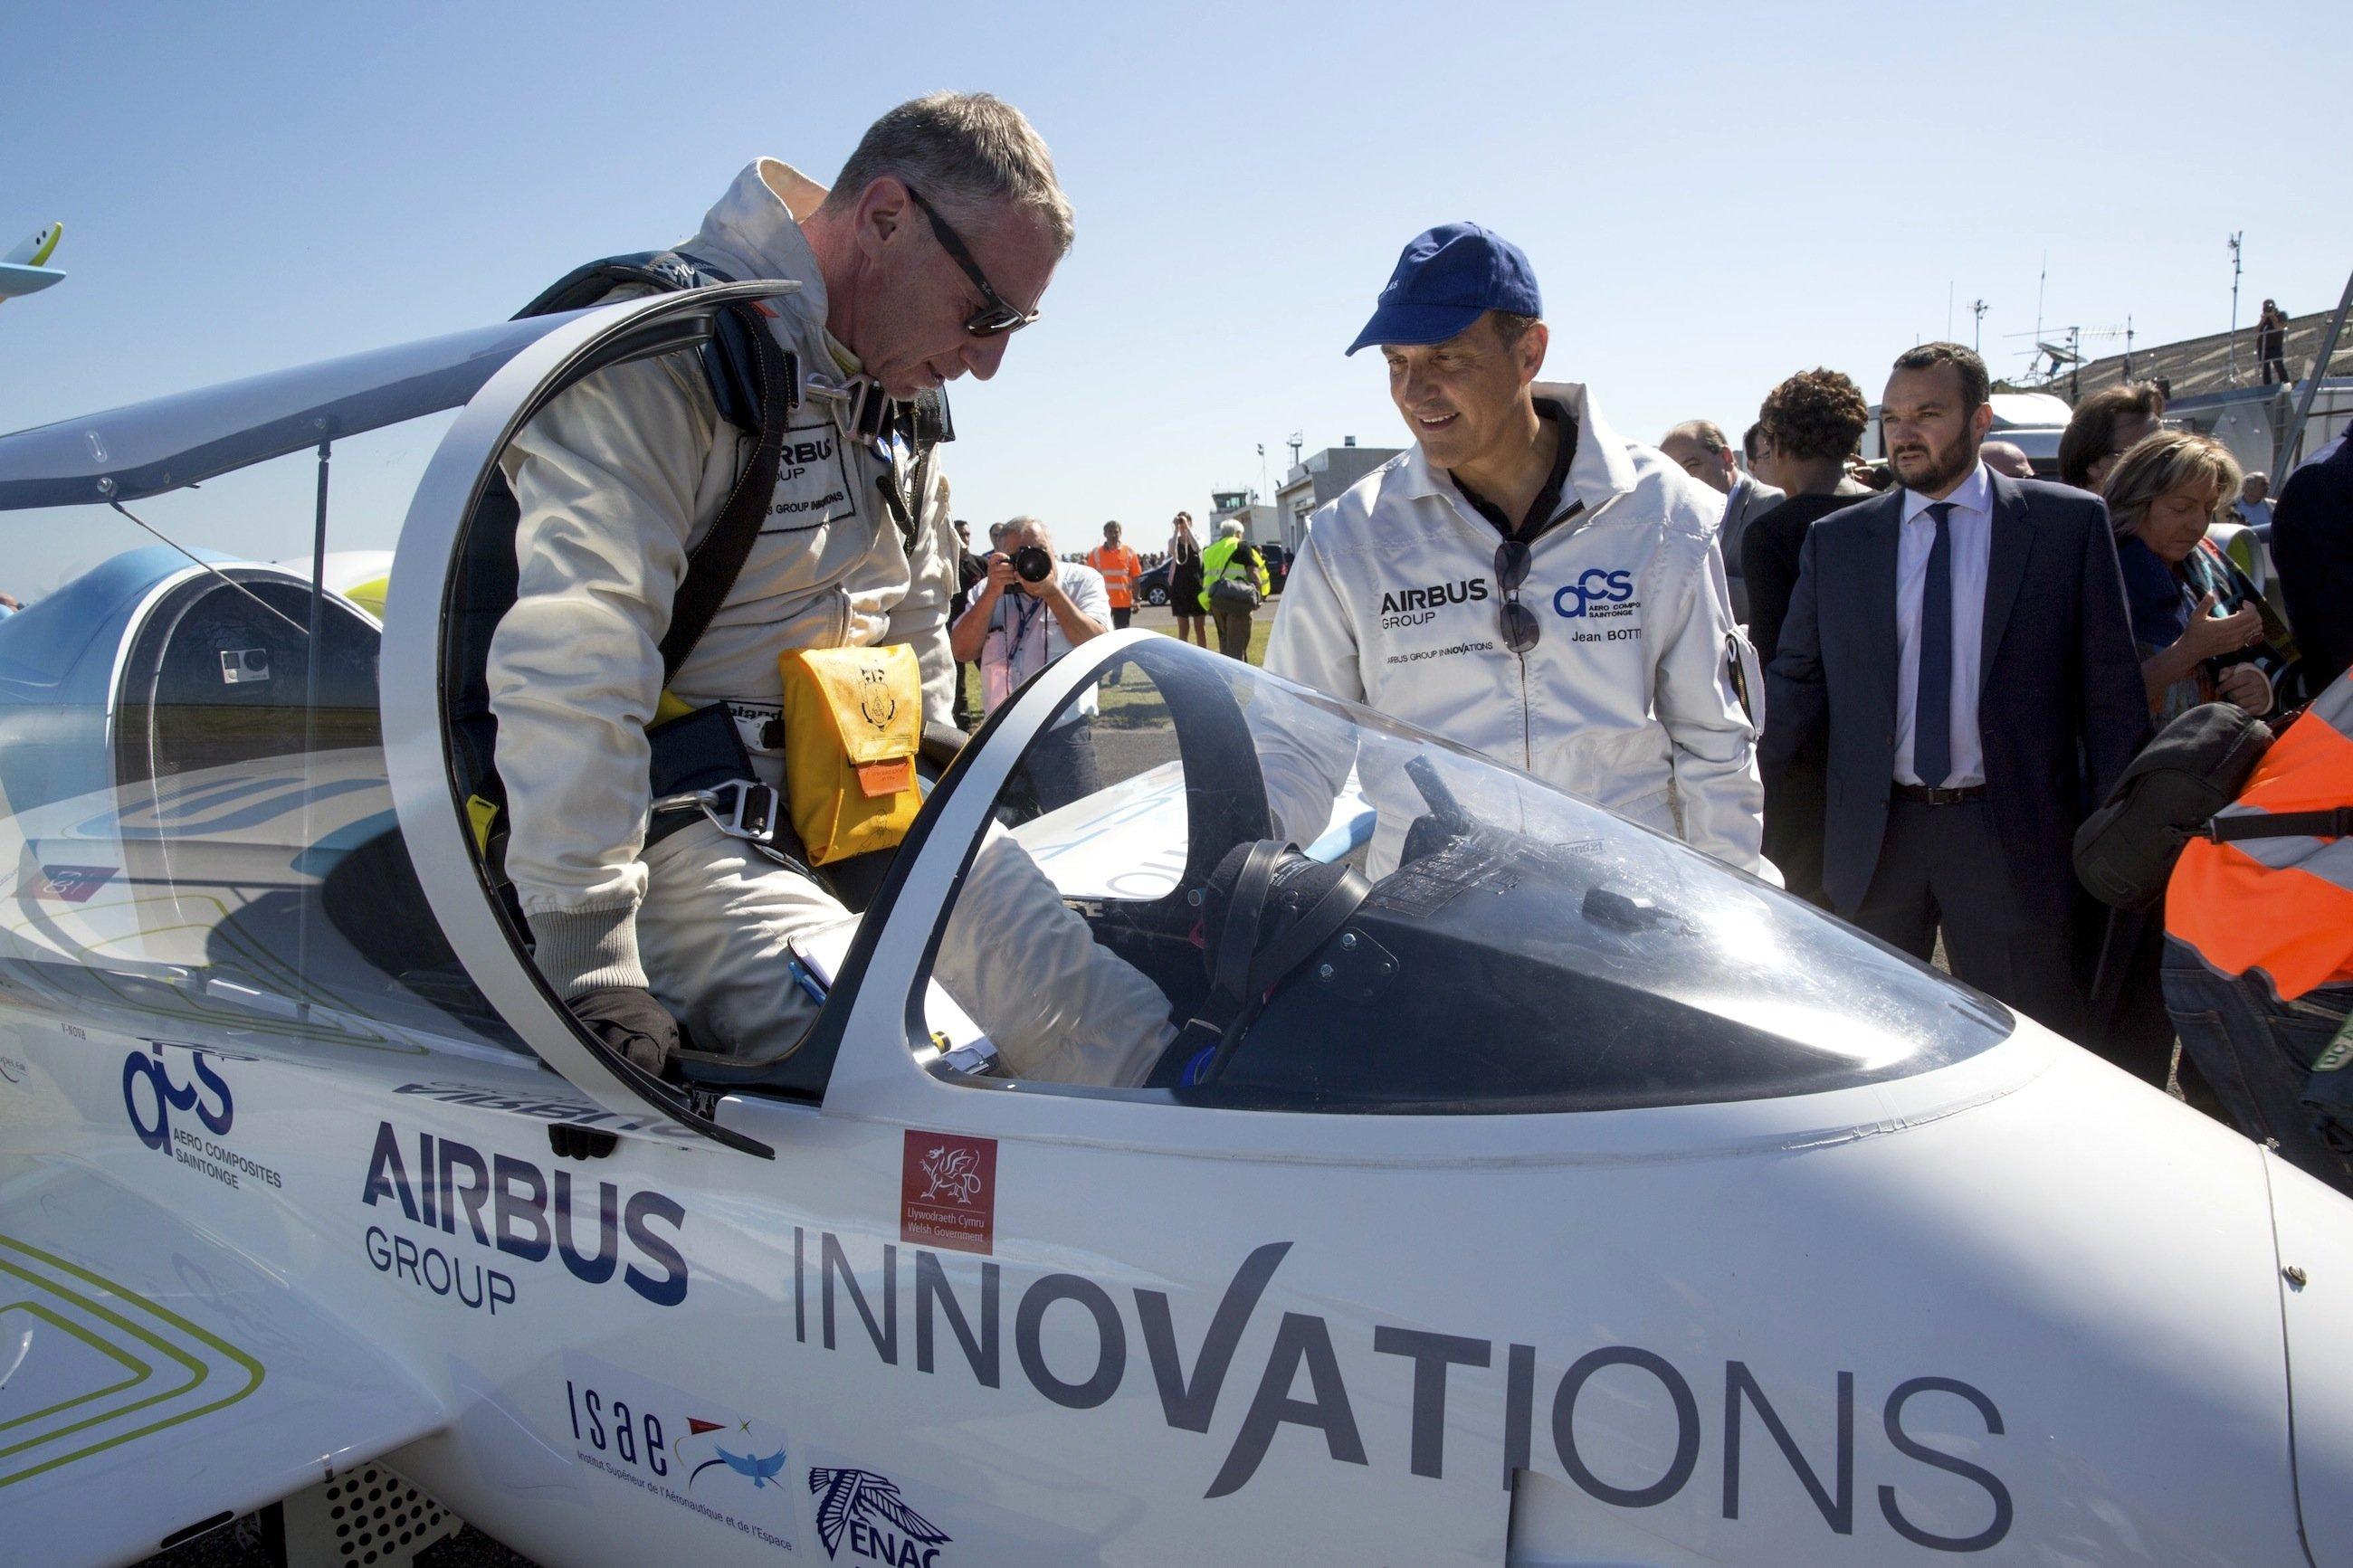 Sicher gelandet in Calais: E-Fan-Pilot Didier Esteyne.